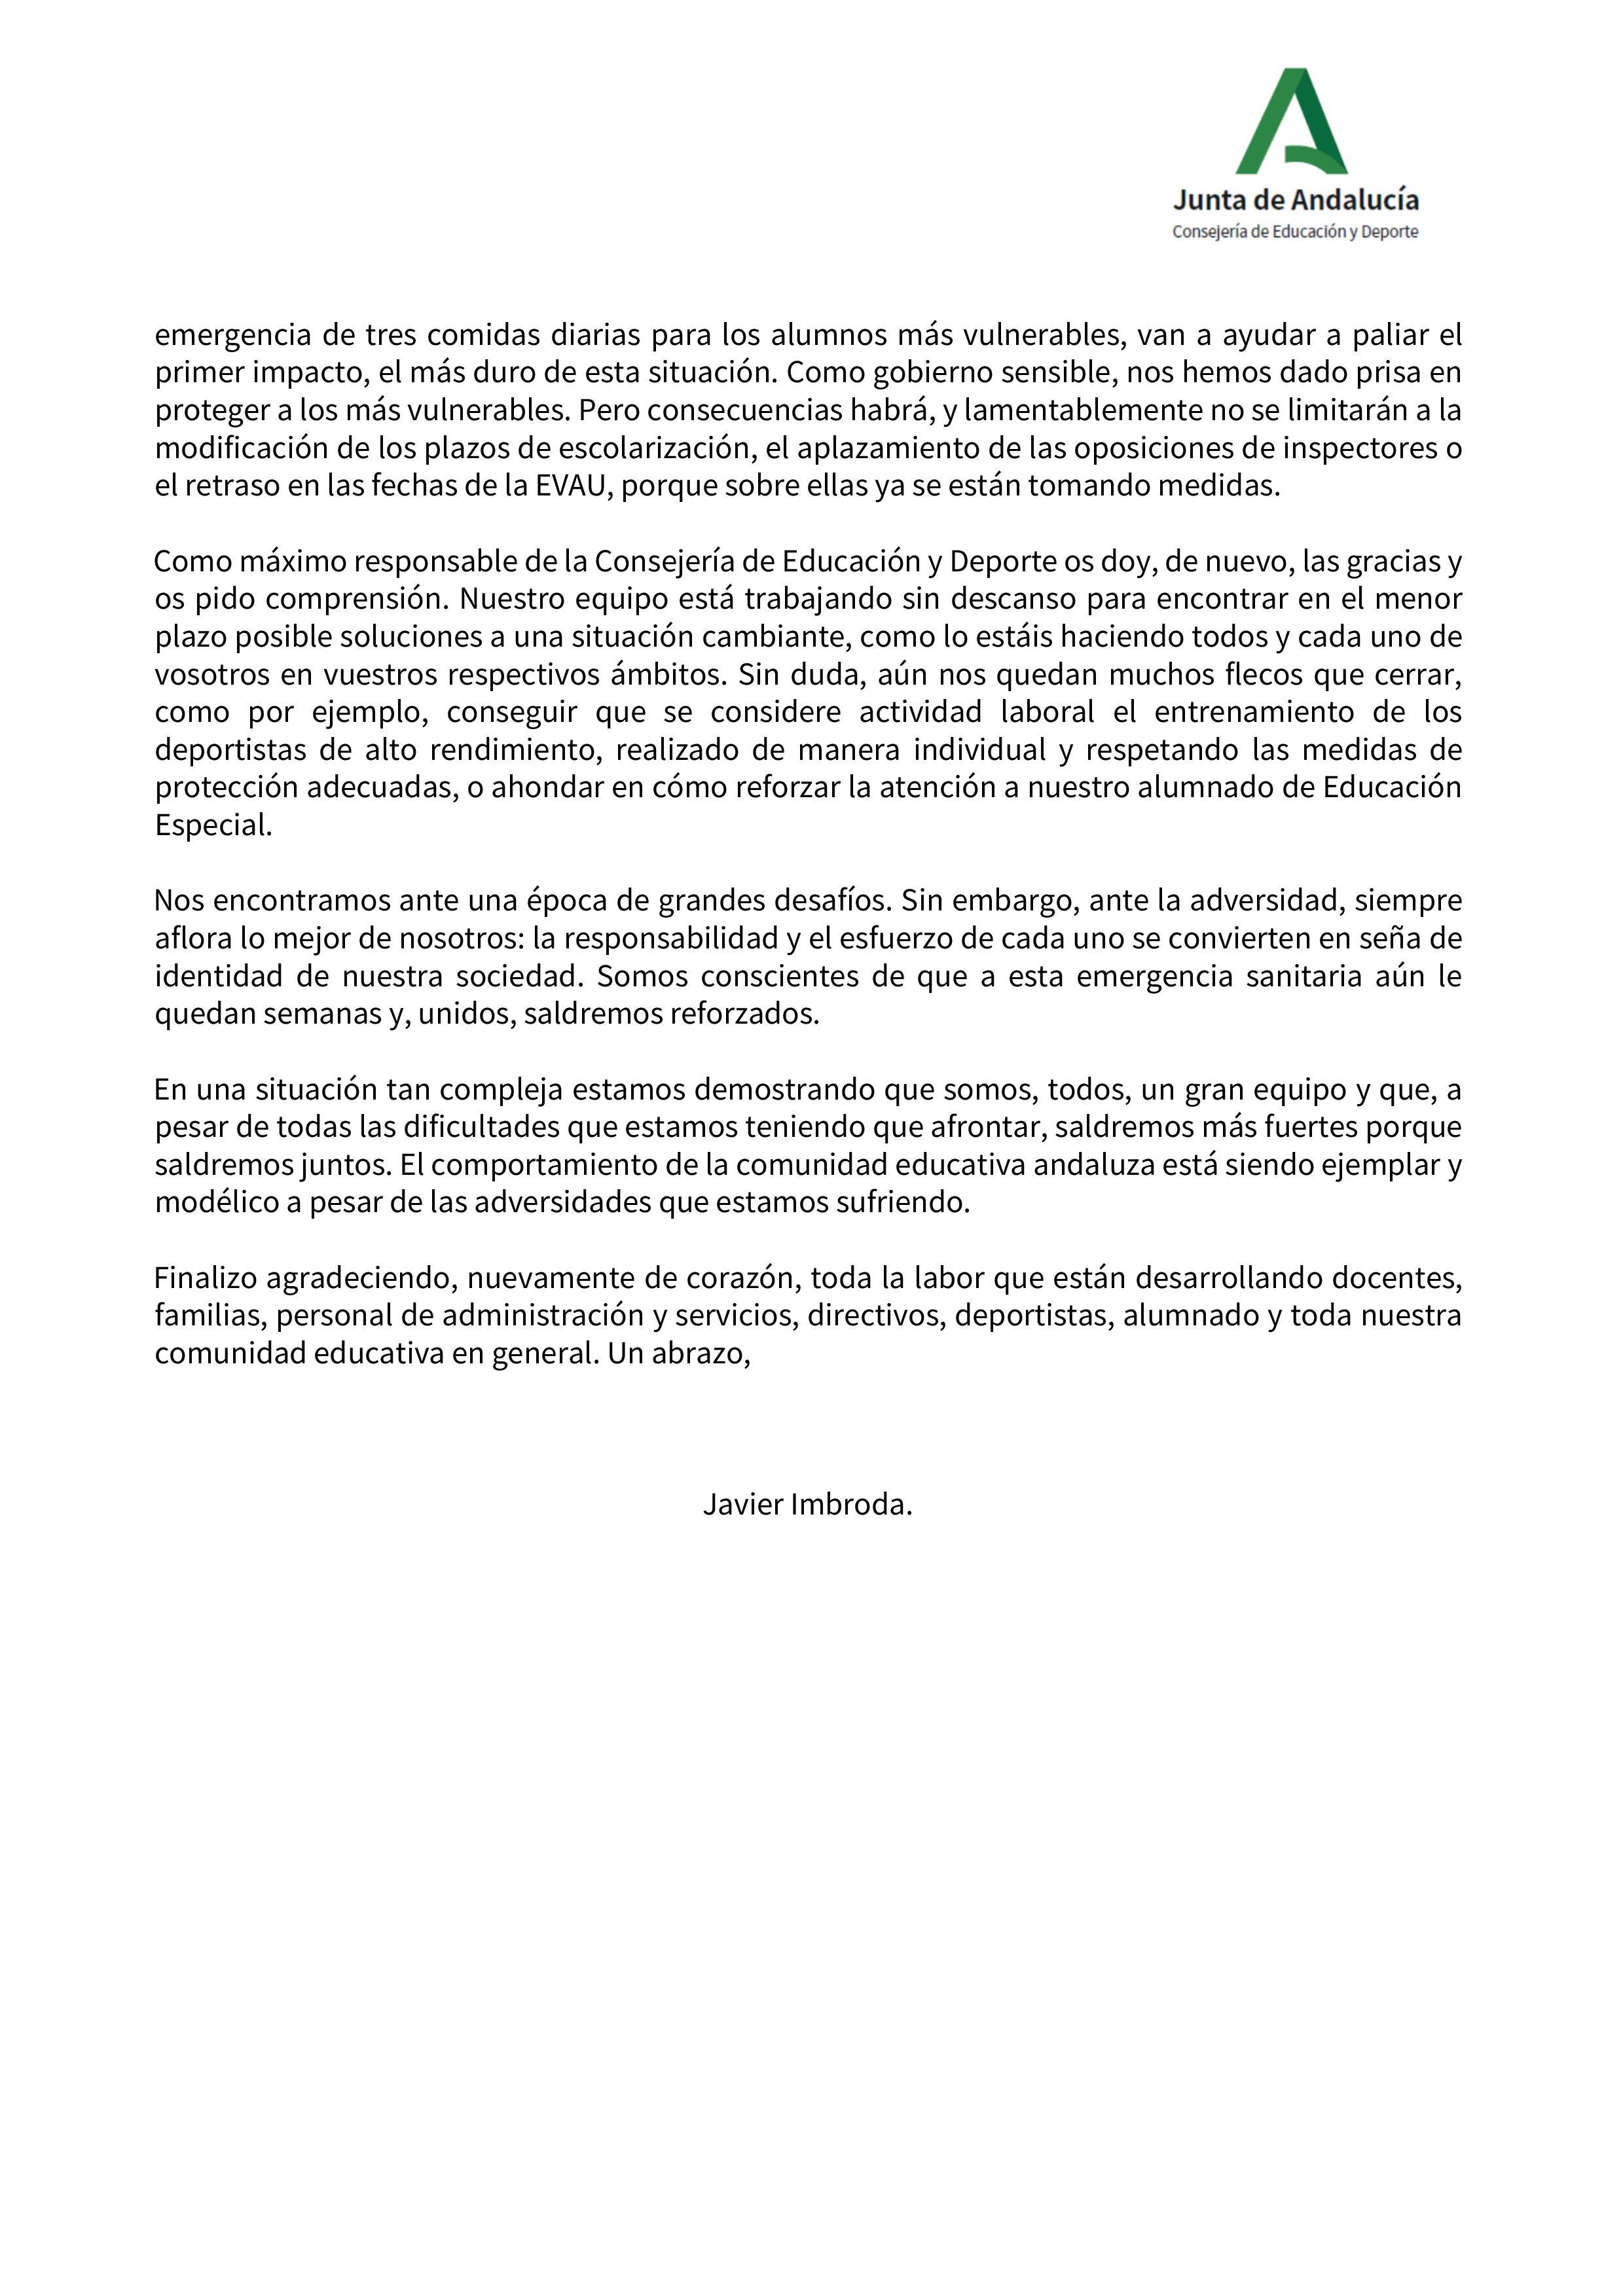 carta-page-002